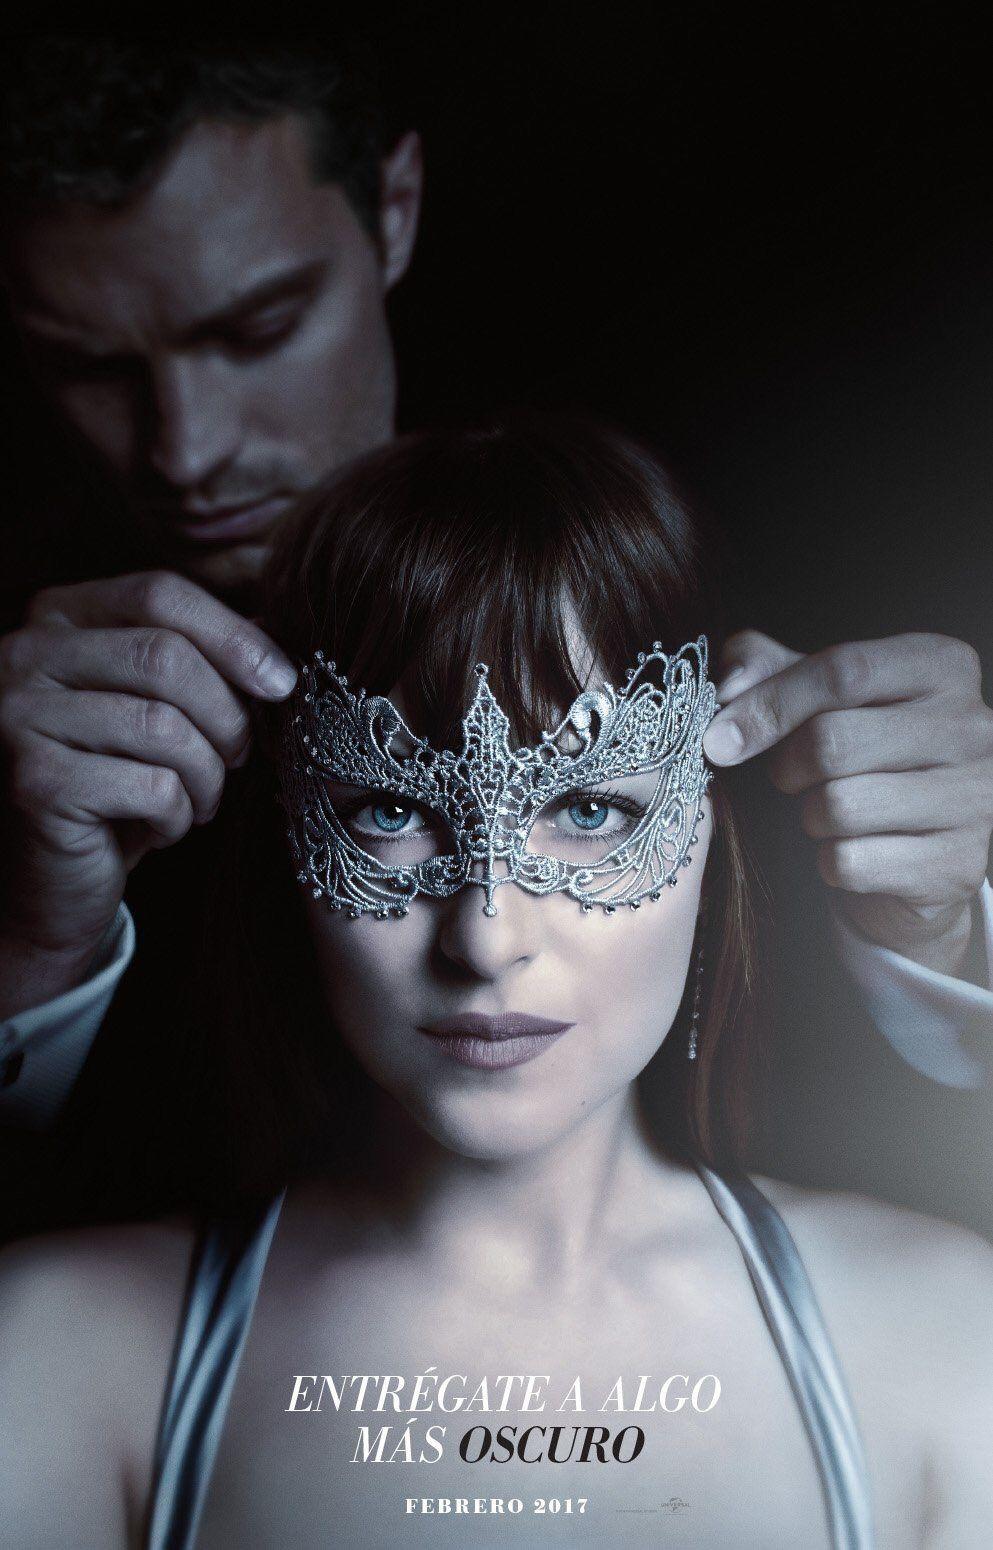 50 Sombras Mas Oscuras Fifty Shades Darker Movie Fifty Shades Darker Poster Fifty Shades Darker Soundtrack